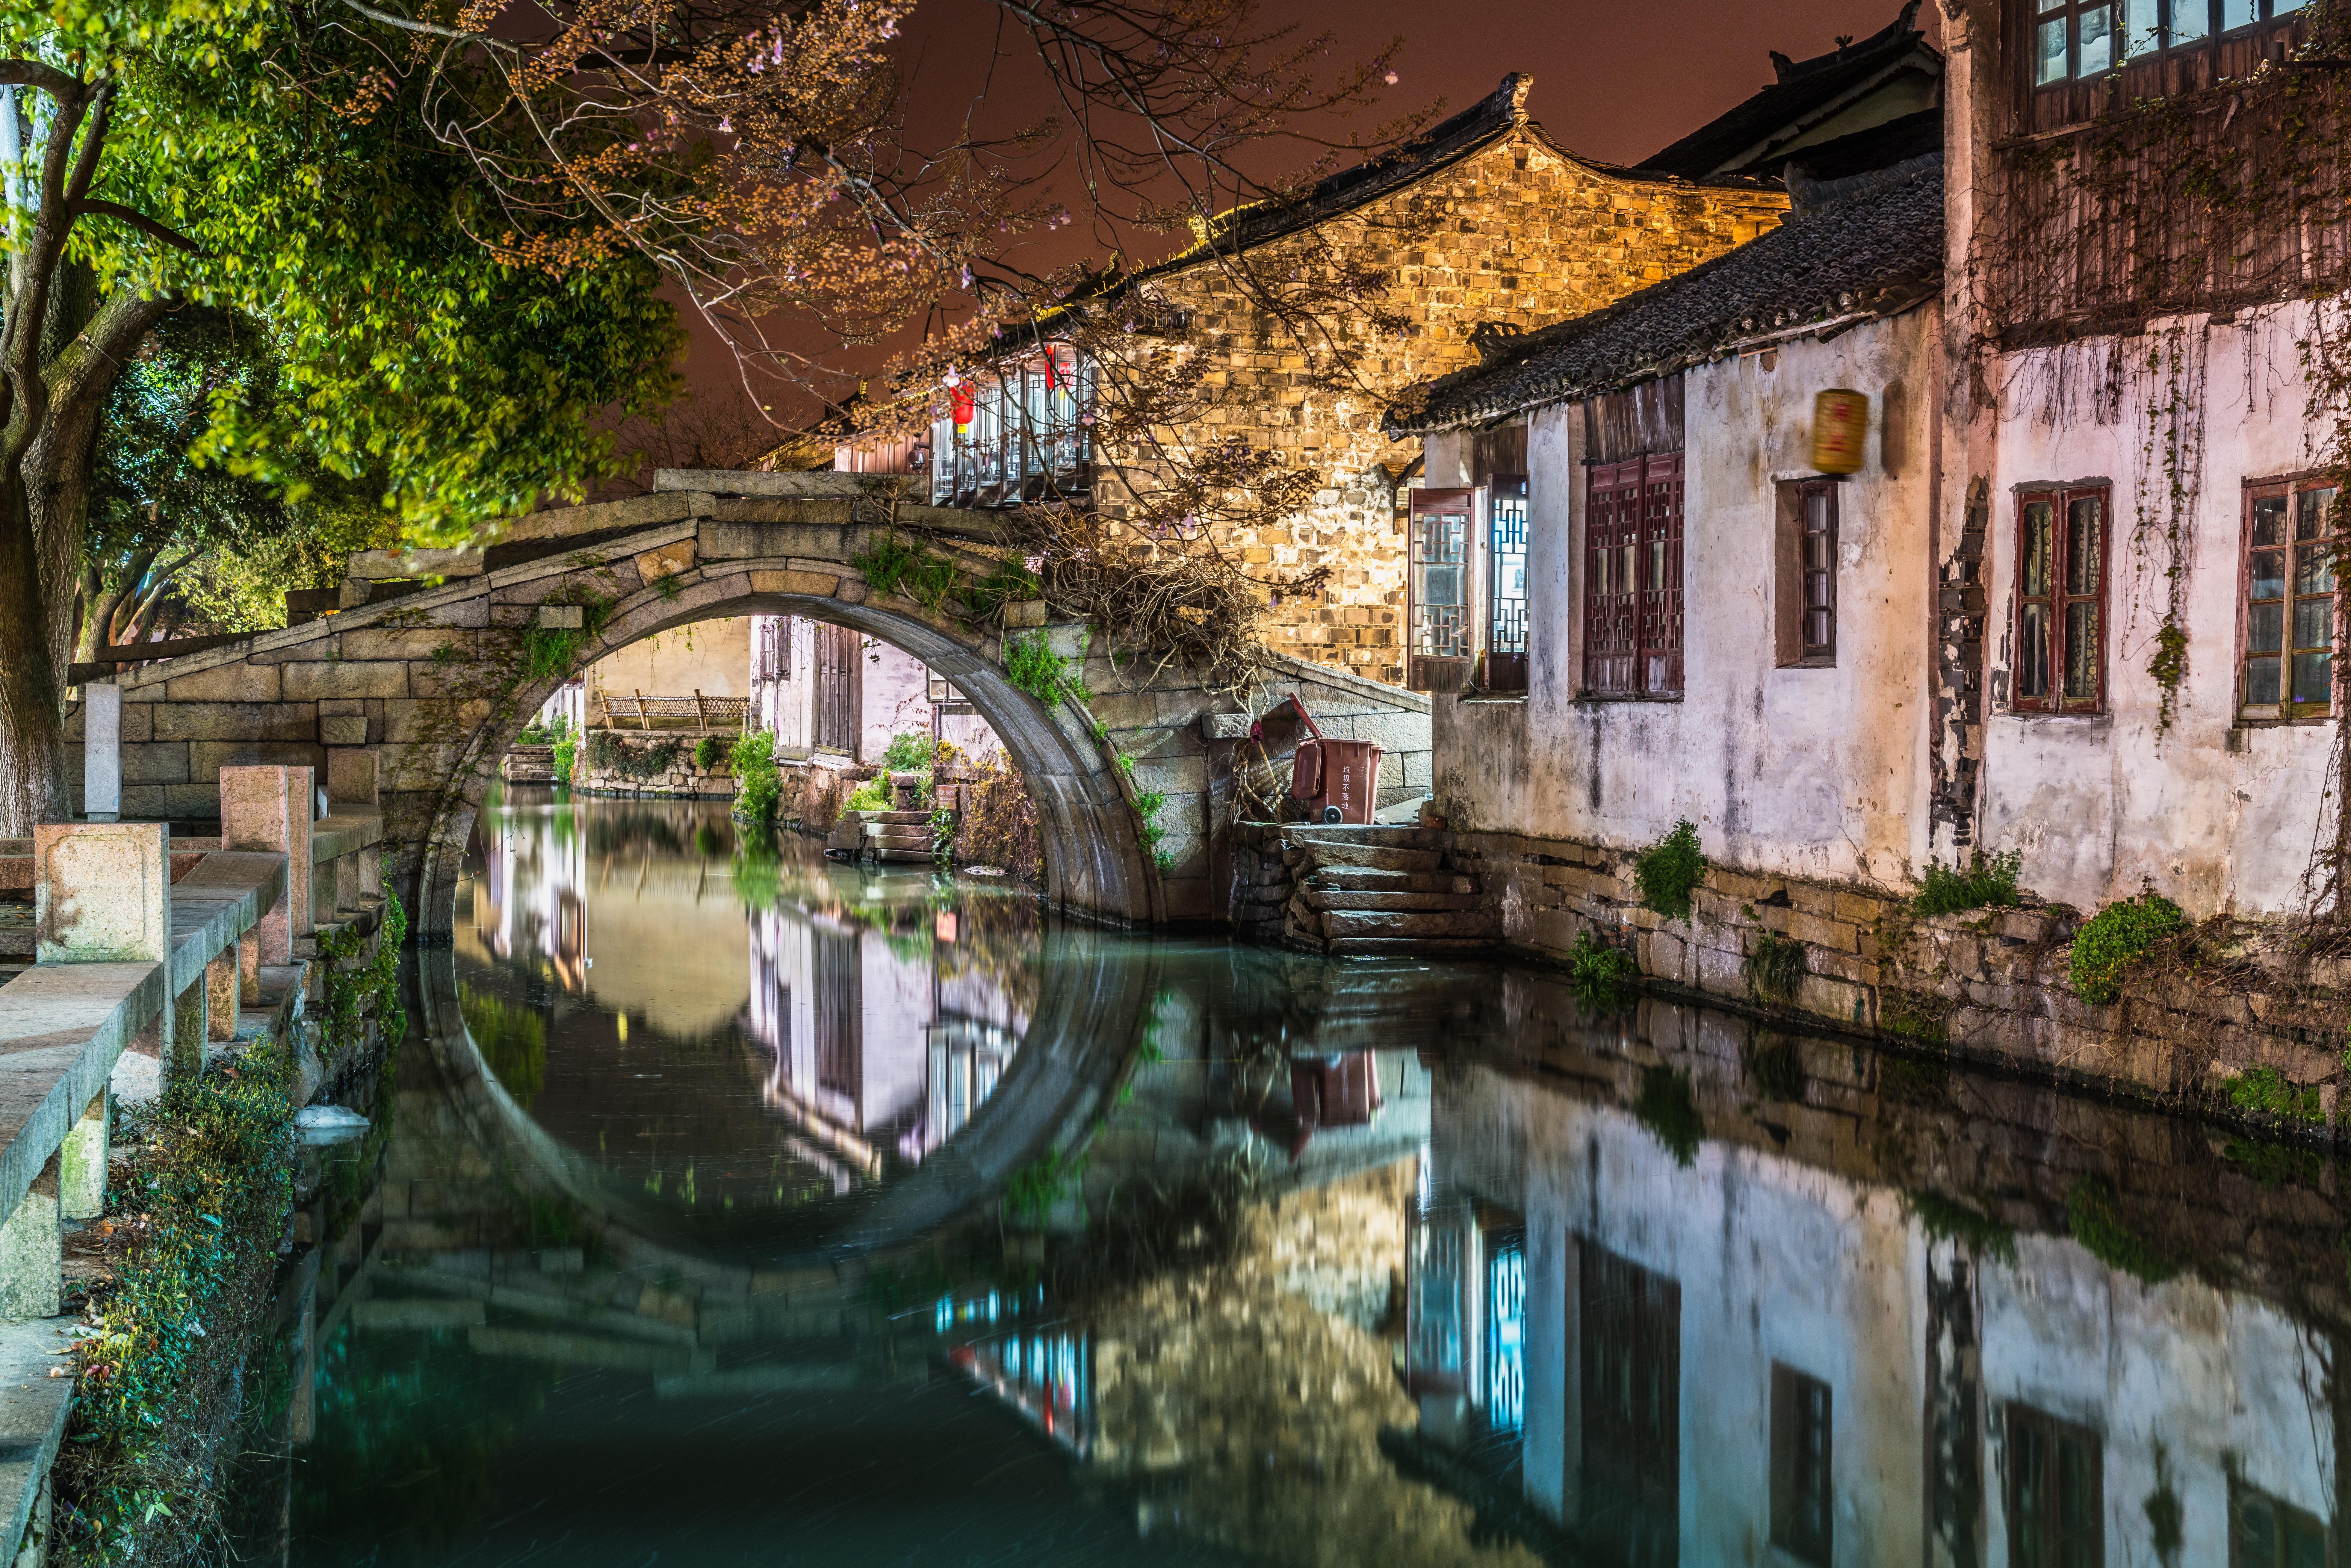 brick bridge over body of water